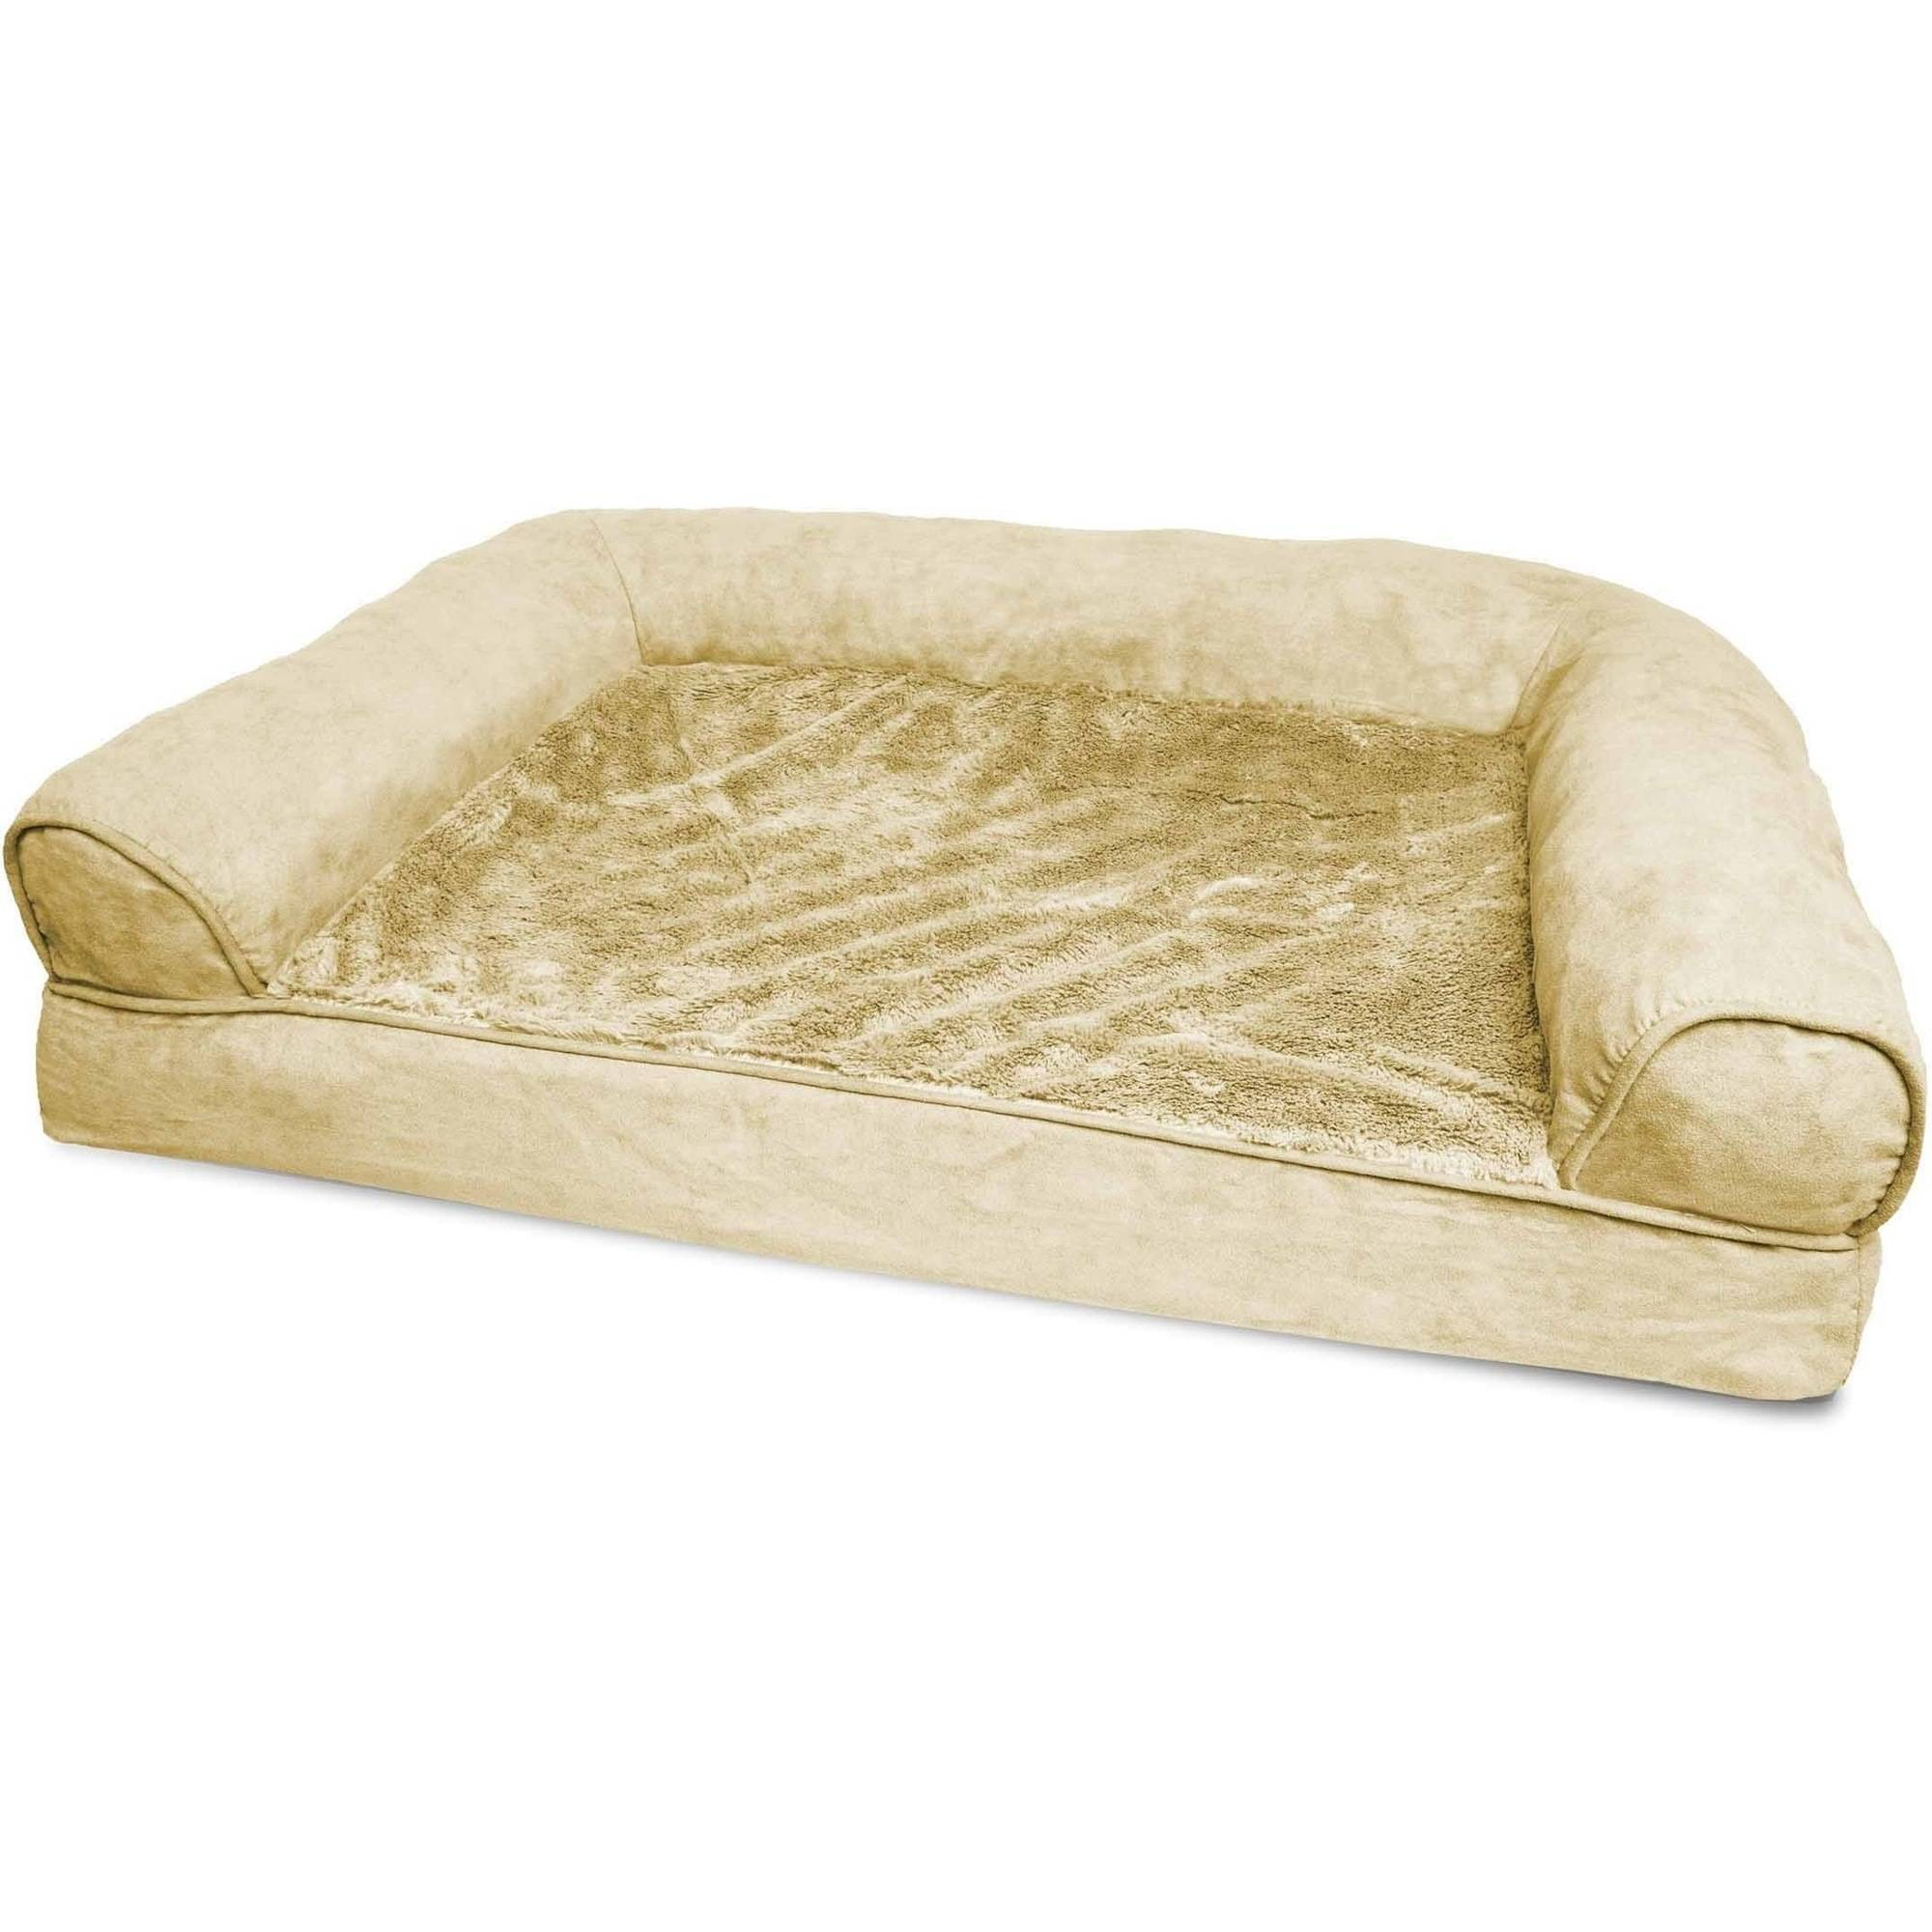 Furhaven Plush Orthopedic Sofa Dog Bed Pet Bed Ebay